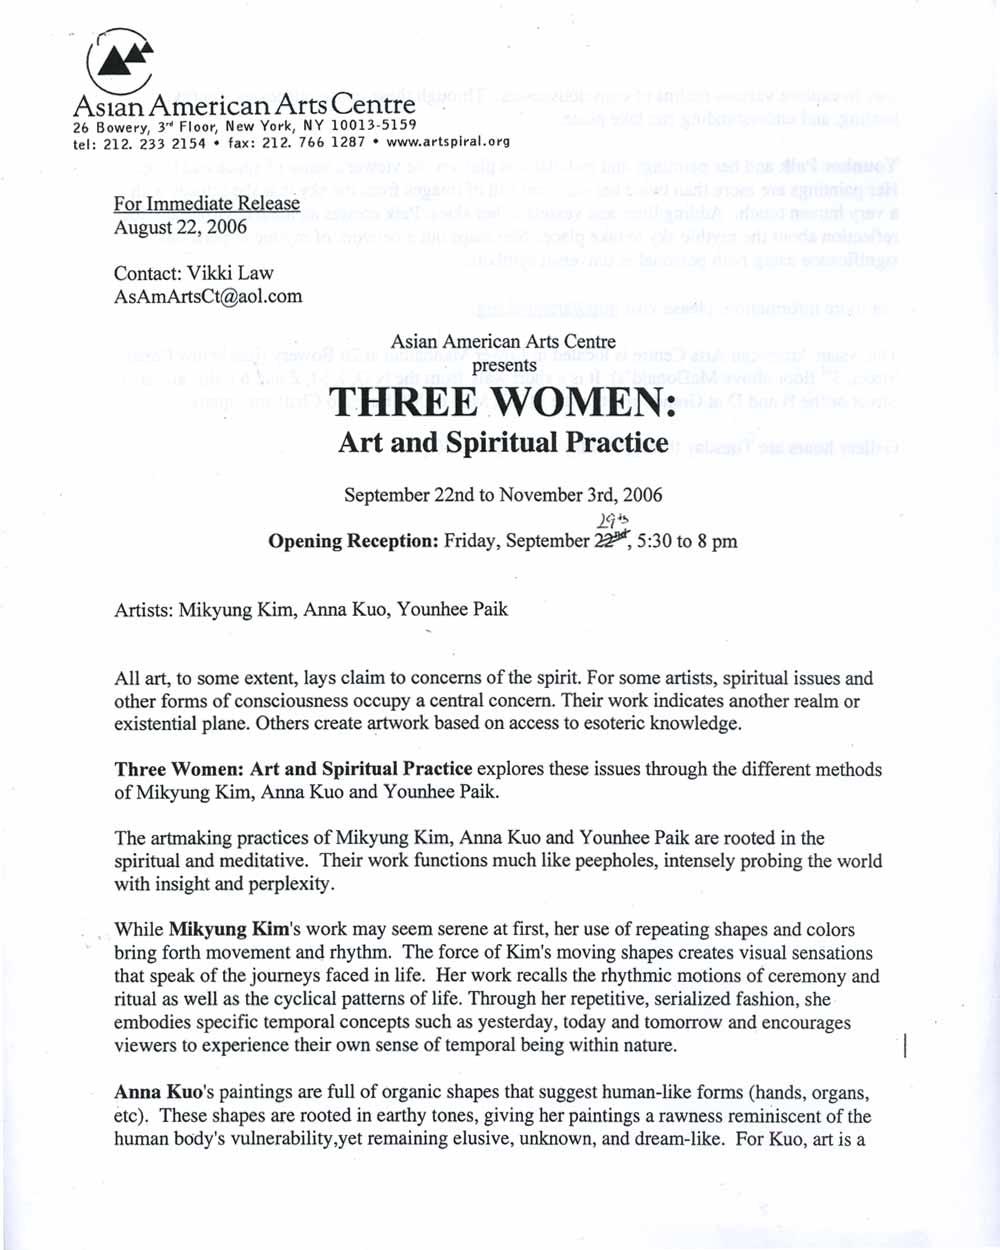 Three Women, press release, pg 1